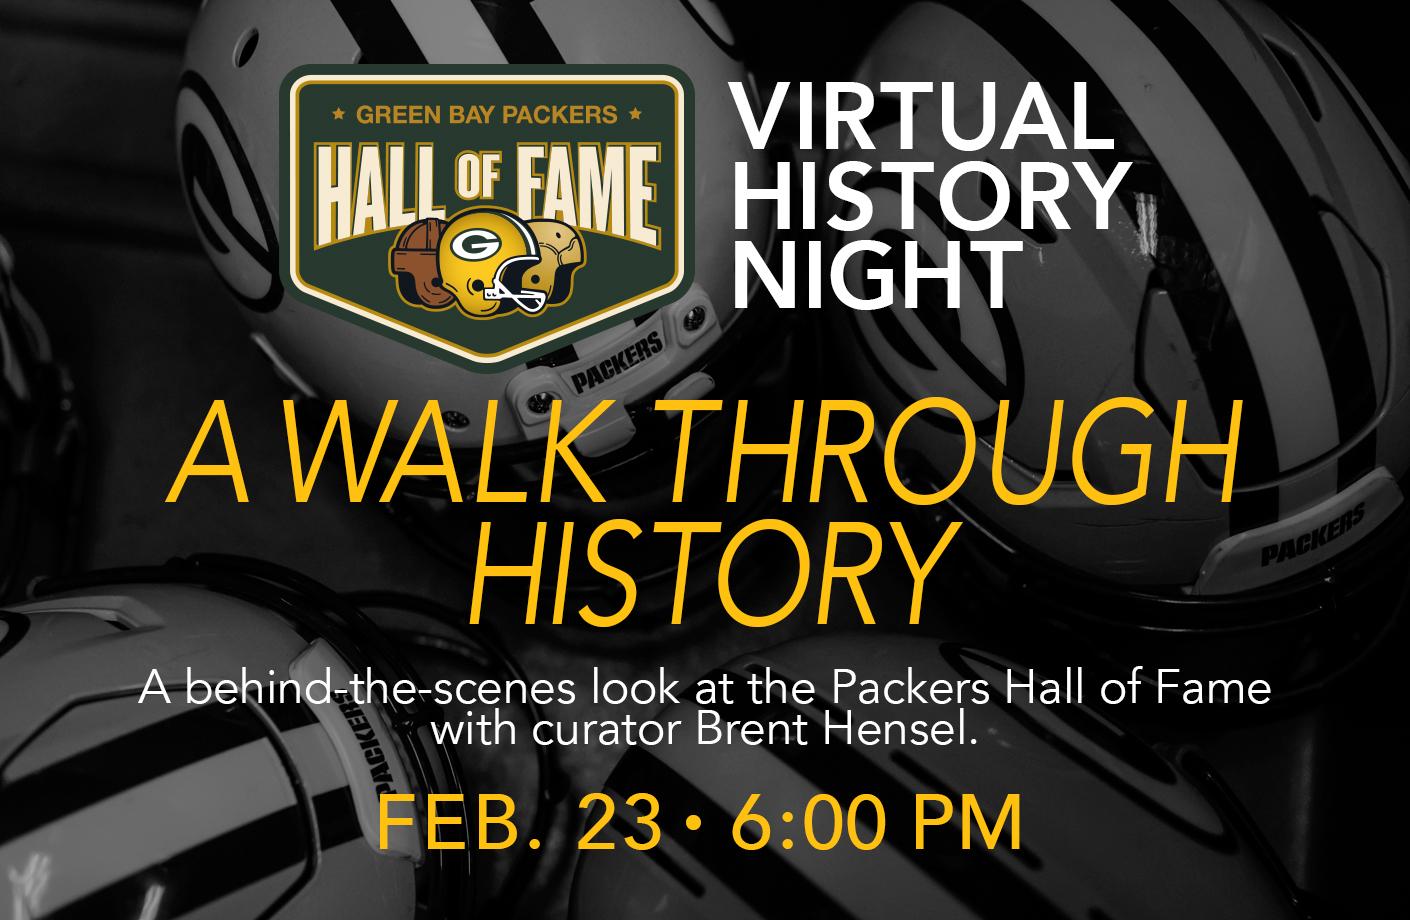 Virtual_History_Tour_Feb_1410x920